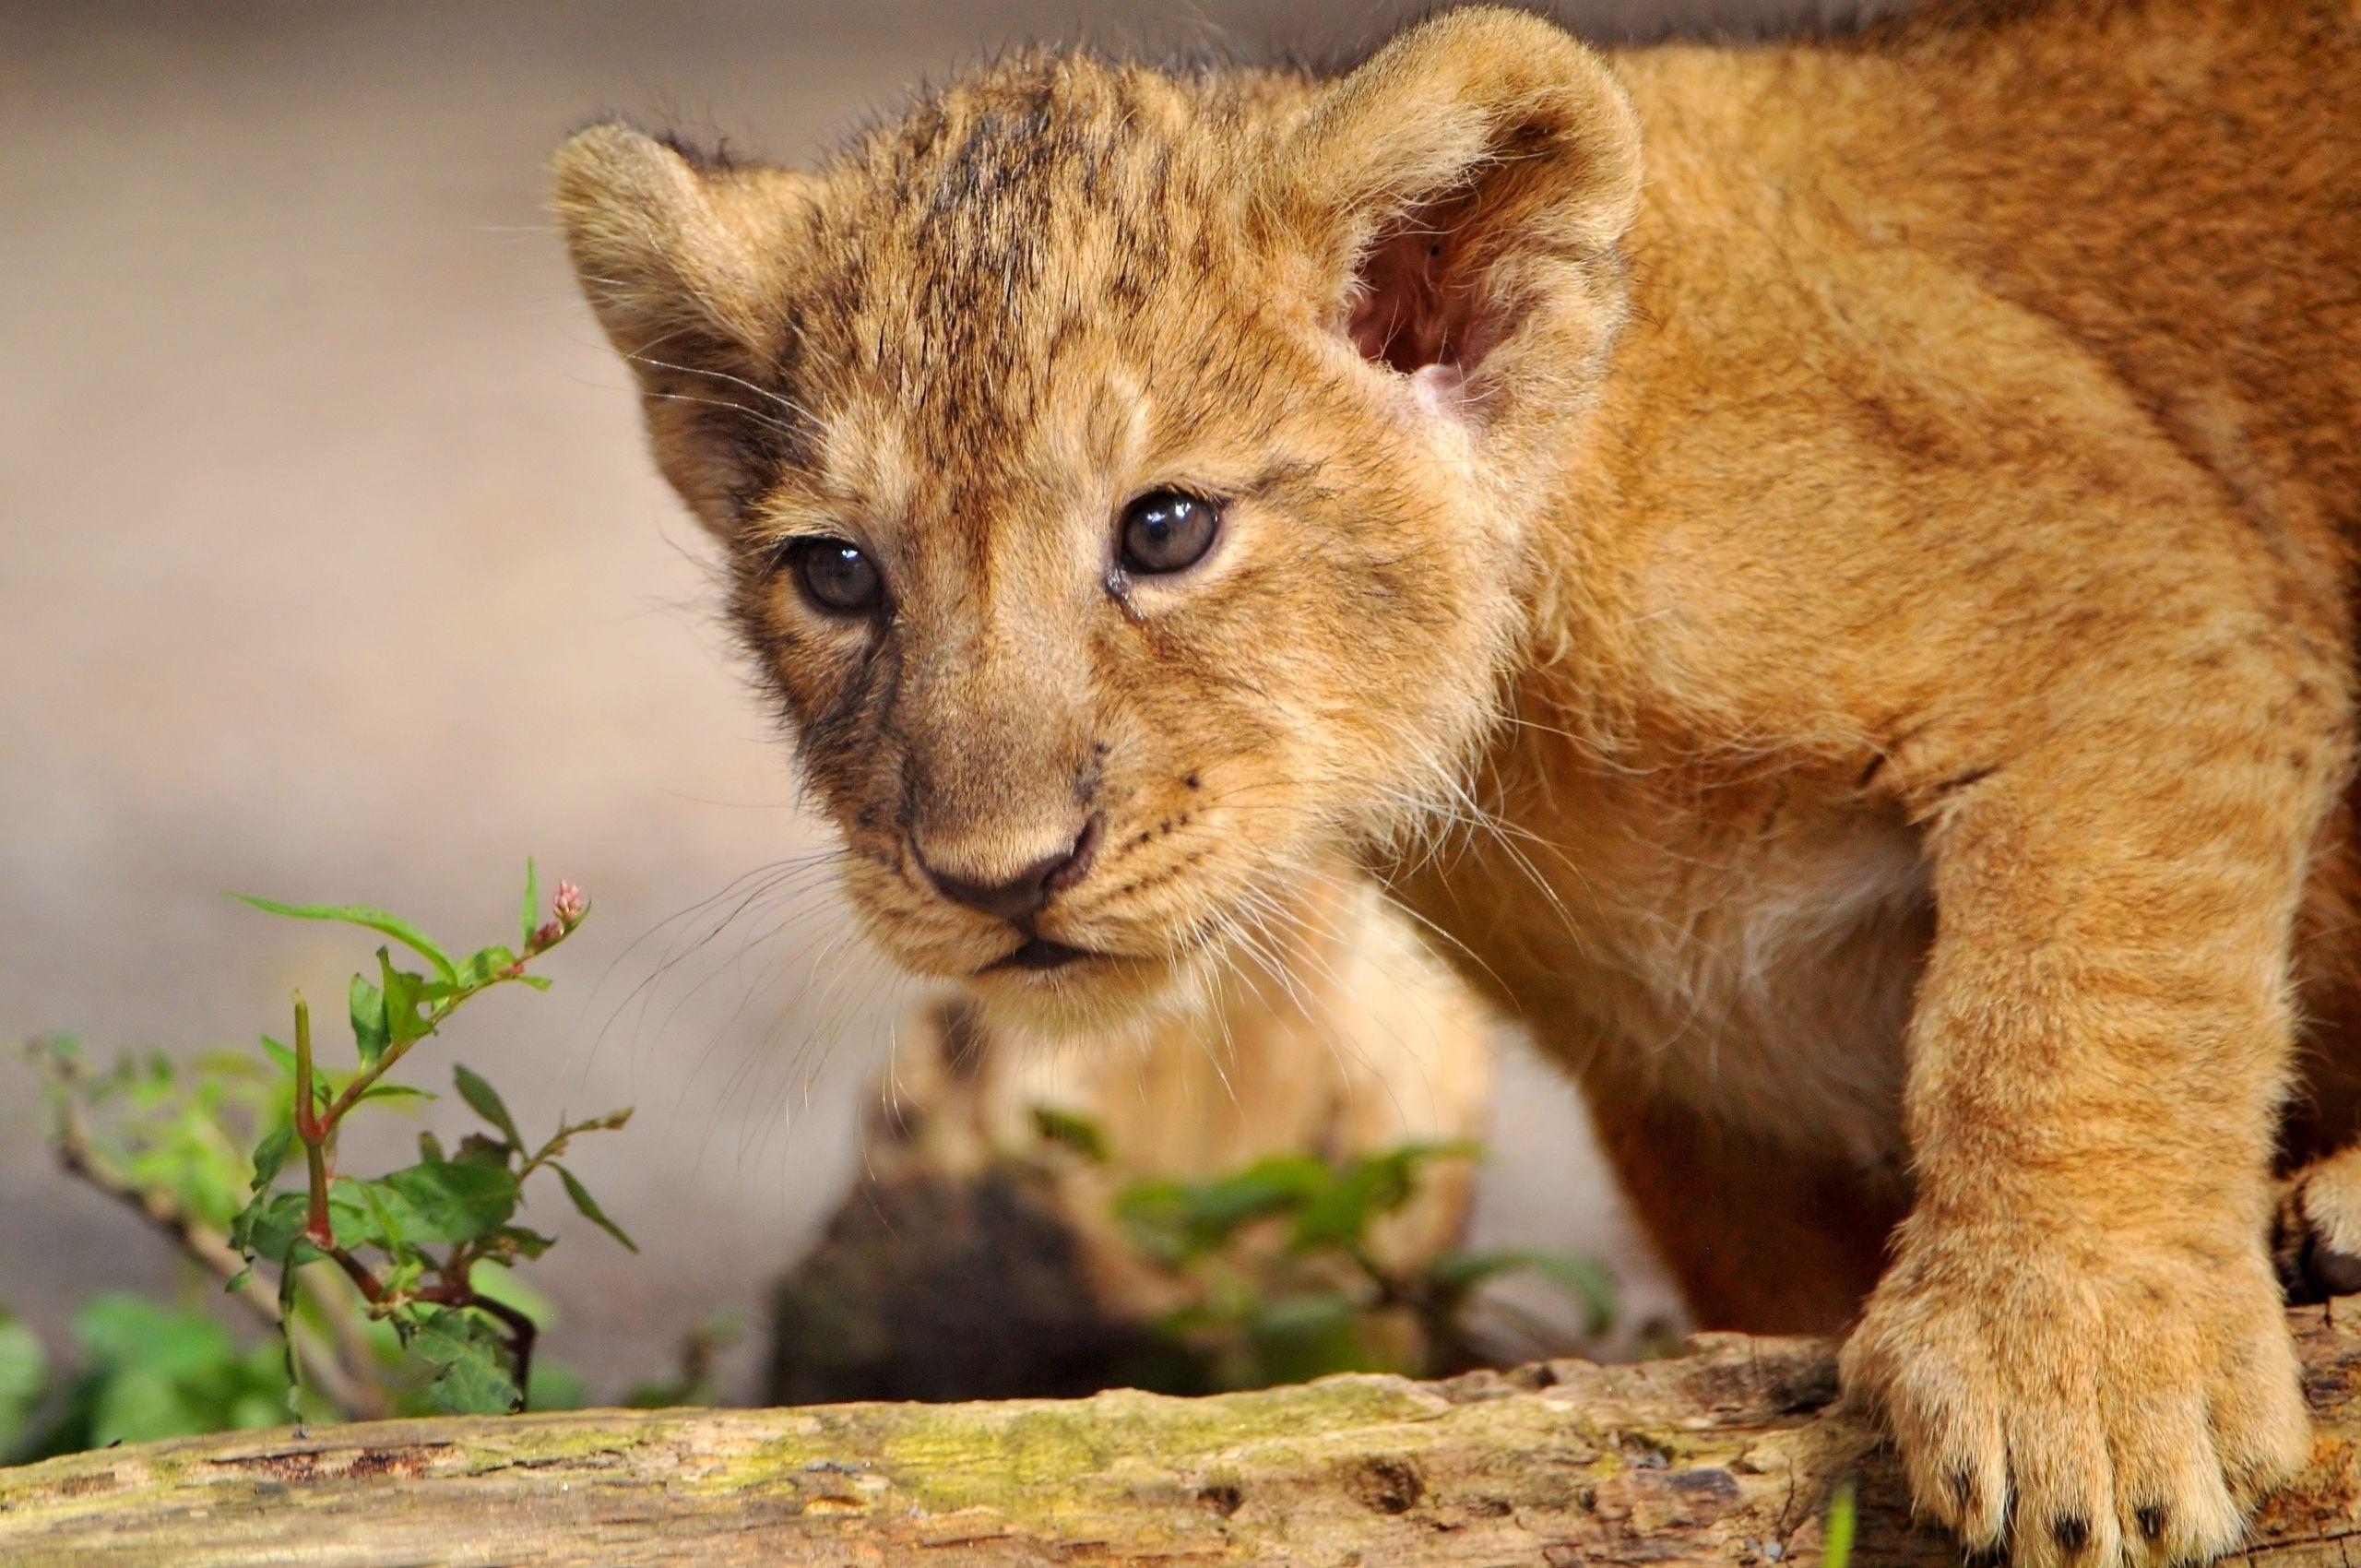 Wallpaper lion cub paw muzzle wild desktop wallpaper 2560x1700